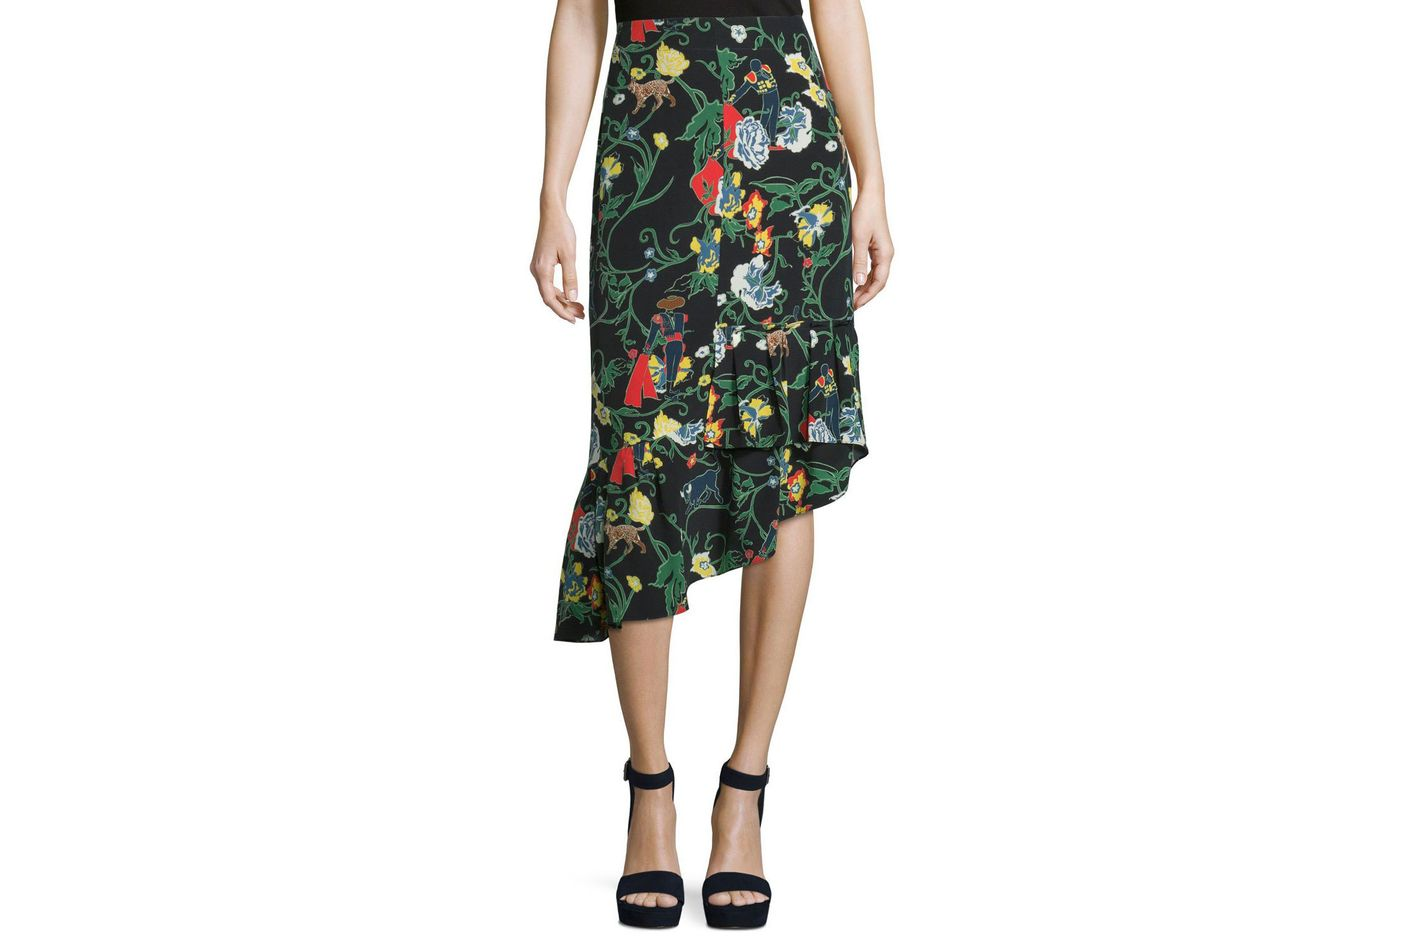 Tibi Gypsy Printed Silk Asymmetric Midi Skirt